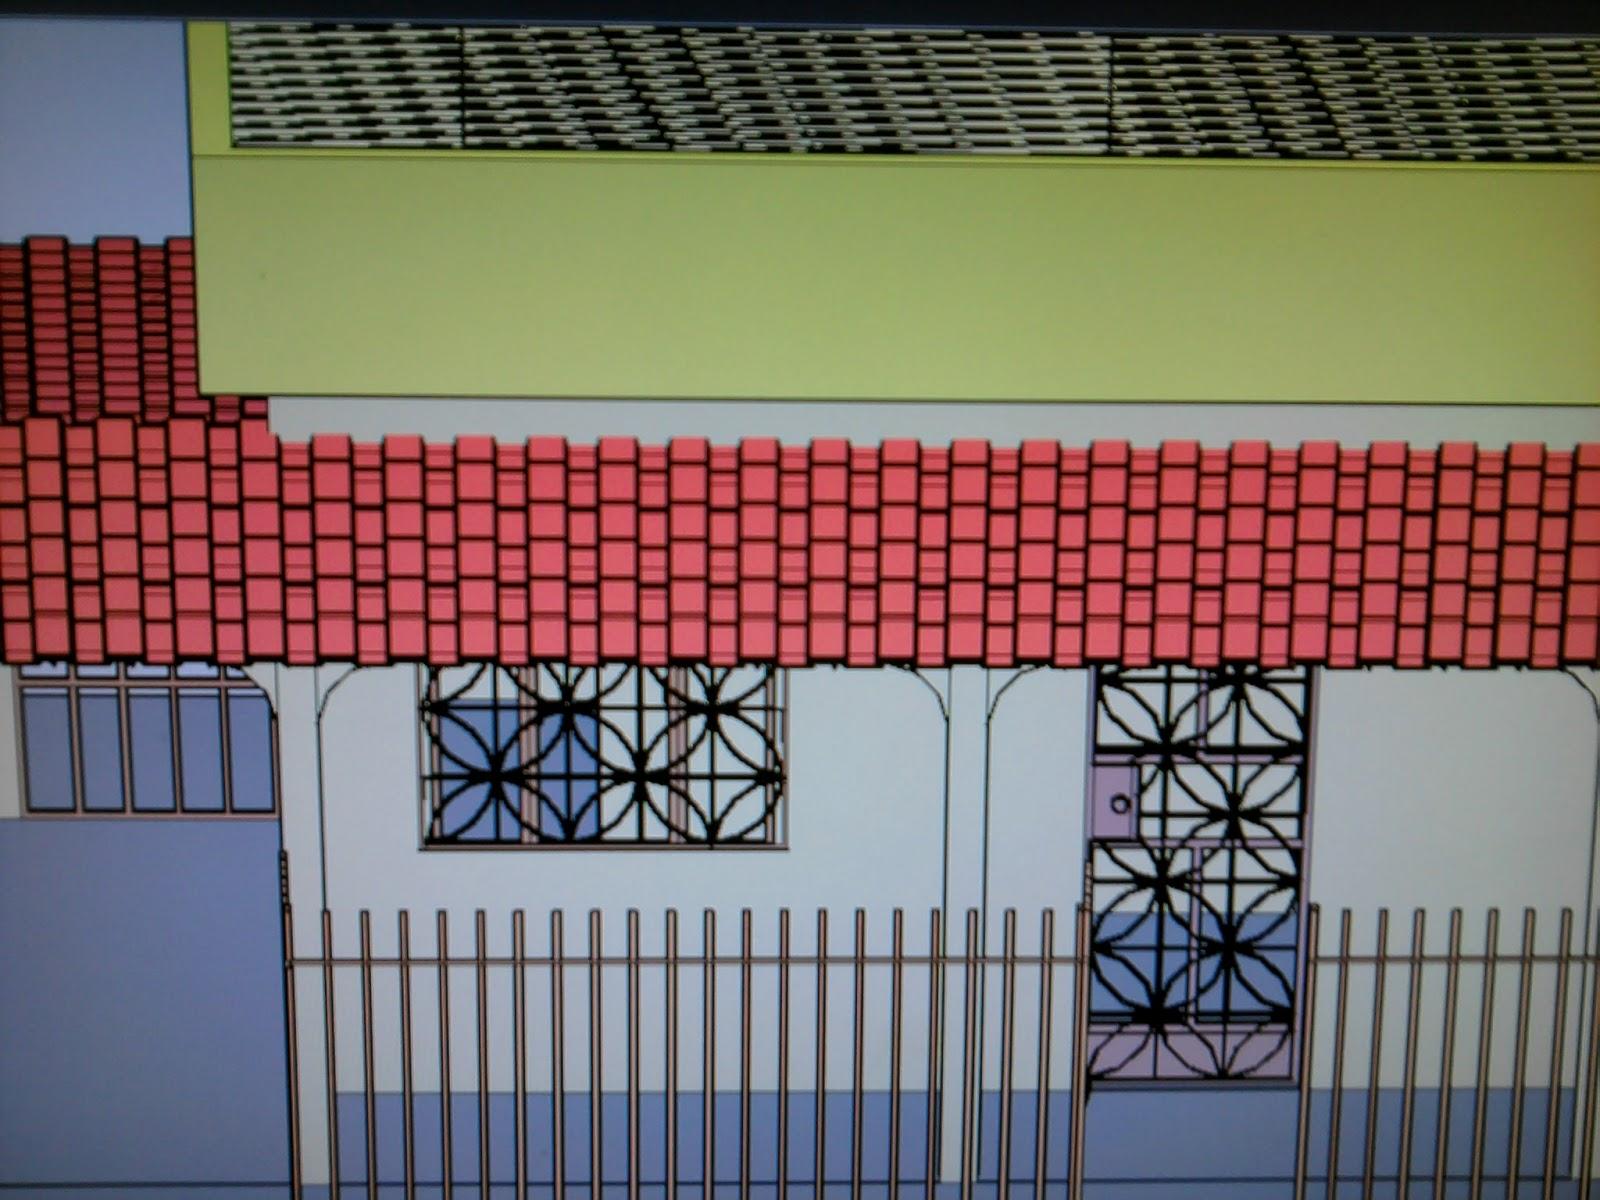 BELOCAD: Baixar Casa 3D para Autocad #9F2C36 1600x1200 Baixar Banheiro Para Autocad